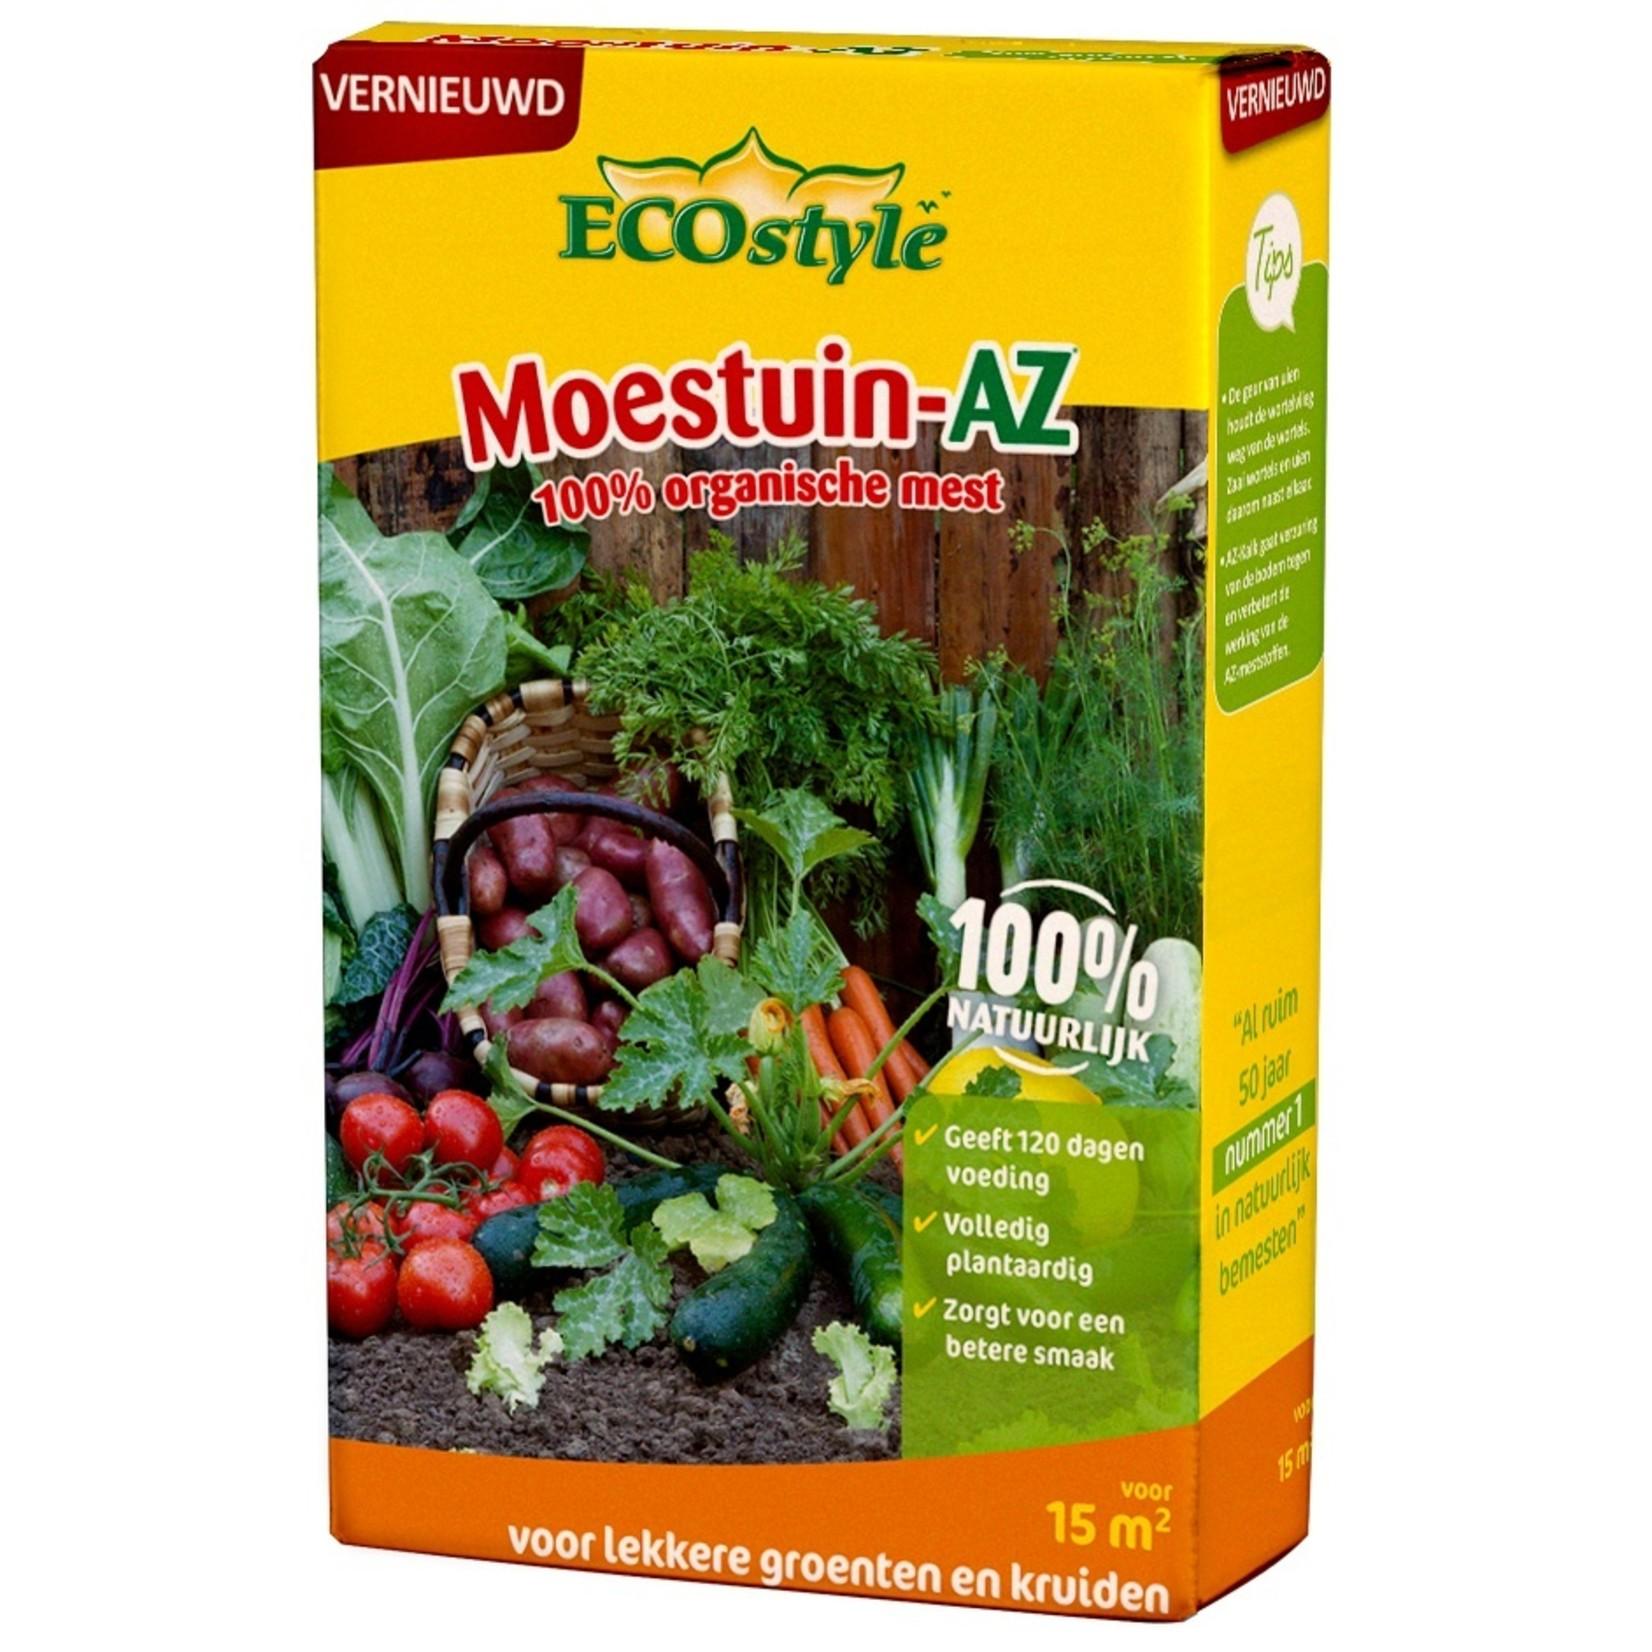 Ecostyle Moestuinmest-AZ  800 gram (15 m²)